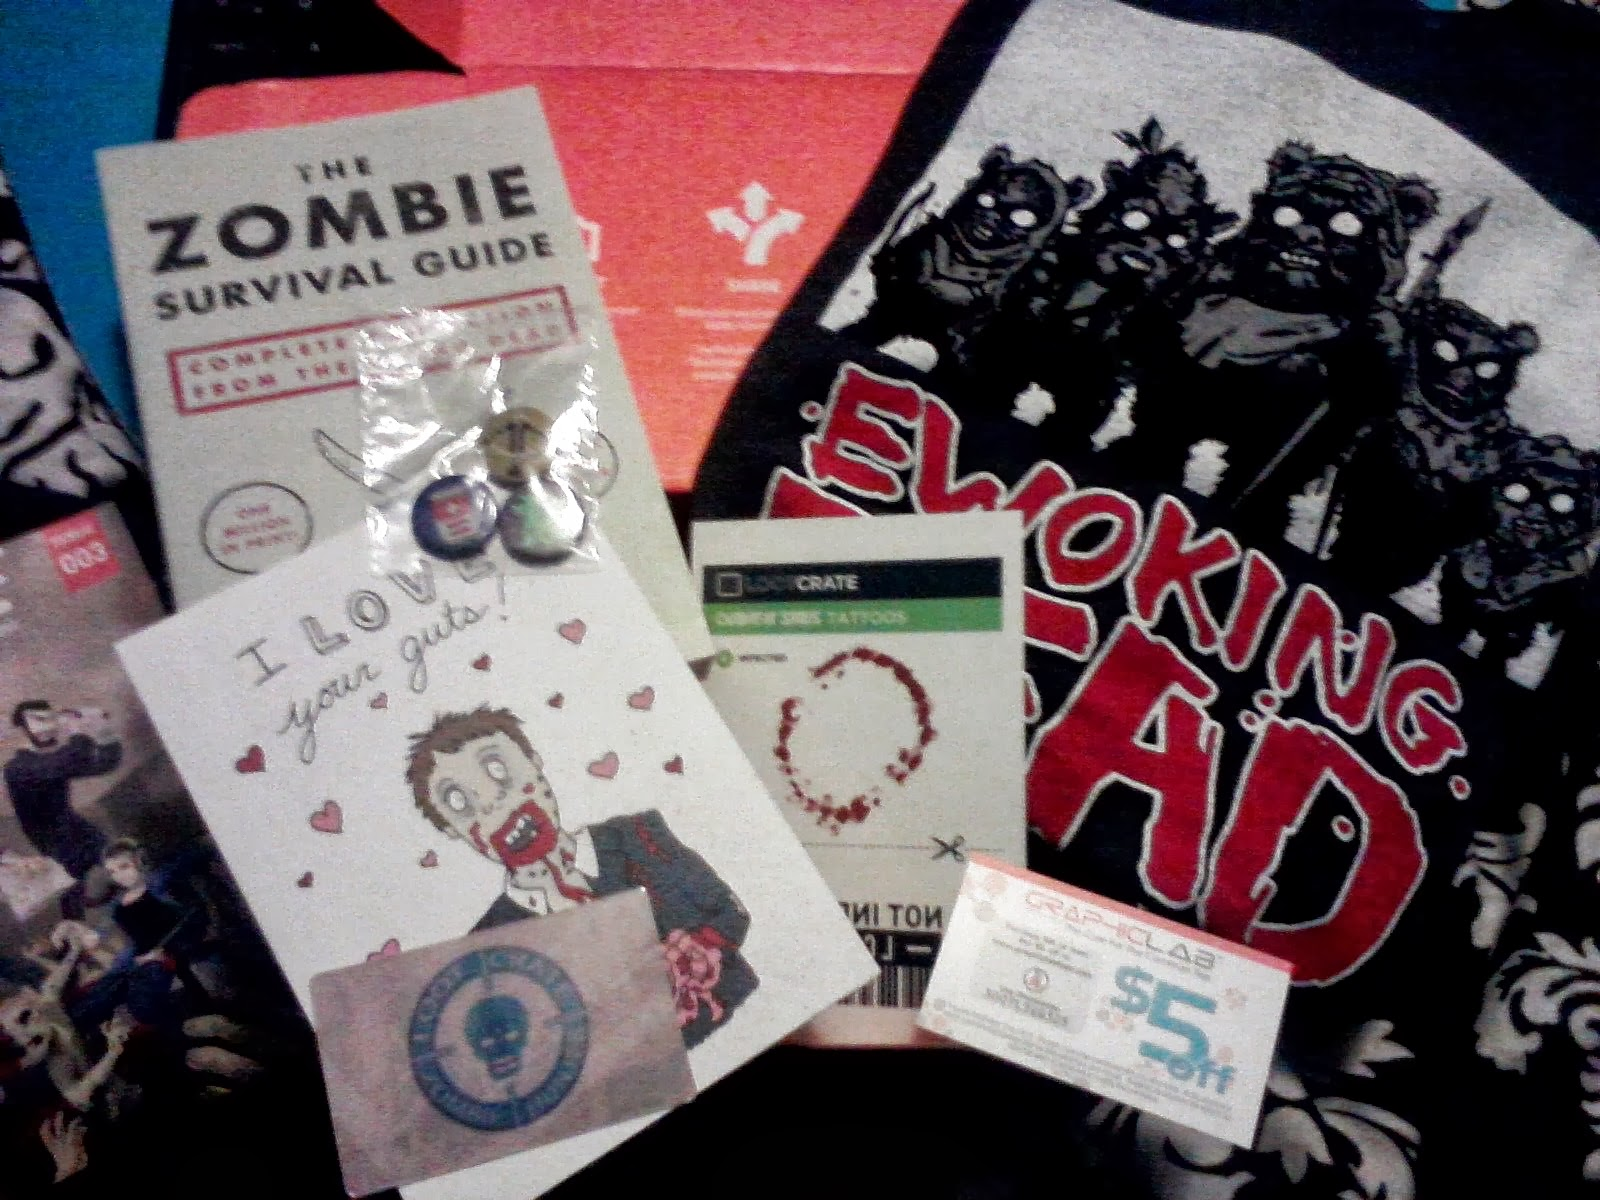 Zombie survival guide look inside volcano